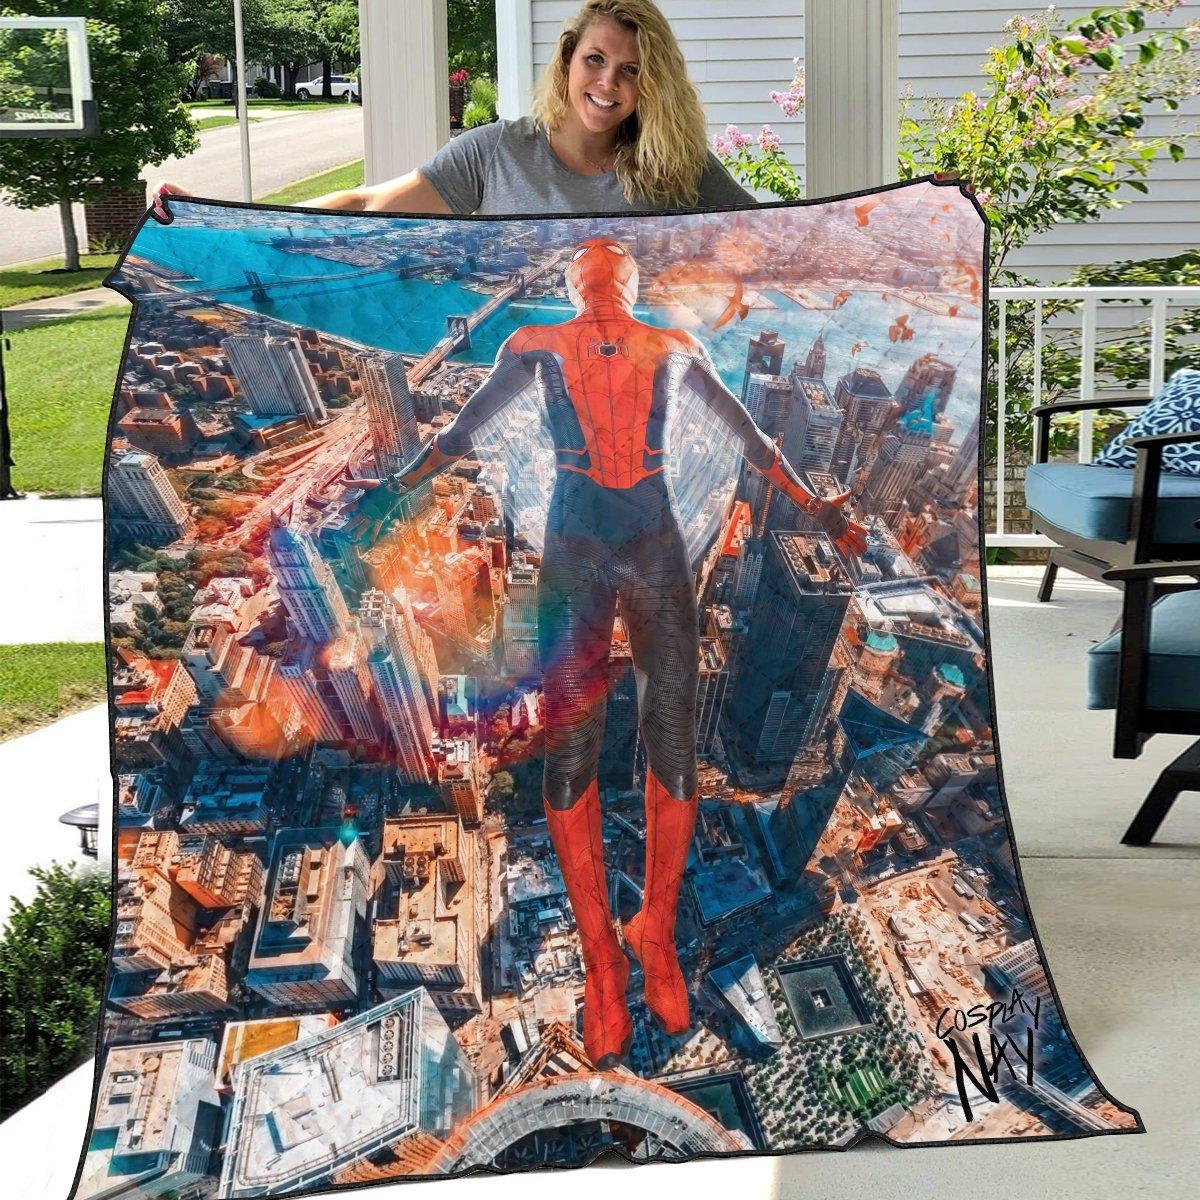 friendly neighborhood hero signed quilt blanket 621126 - Otaku Treat